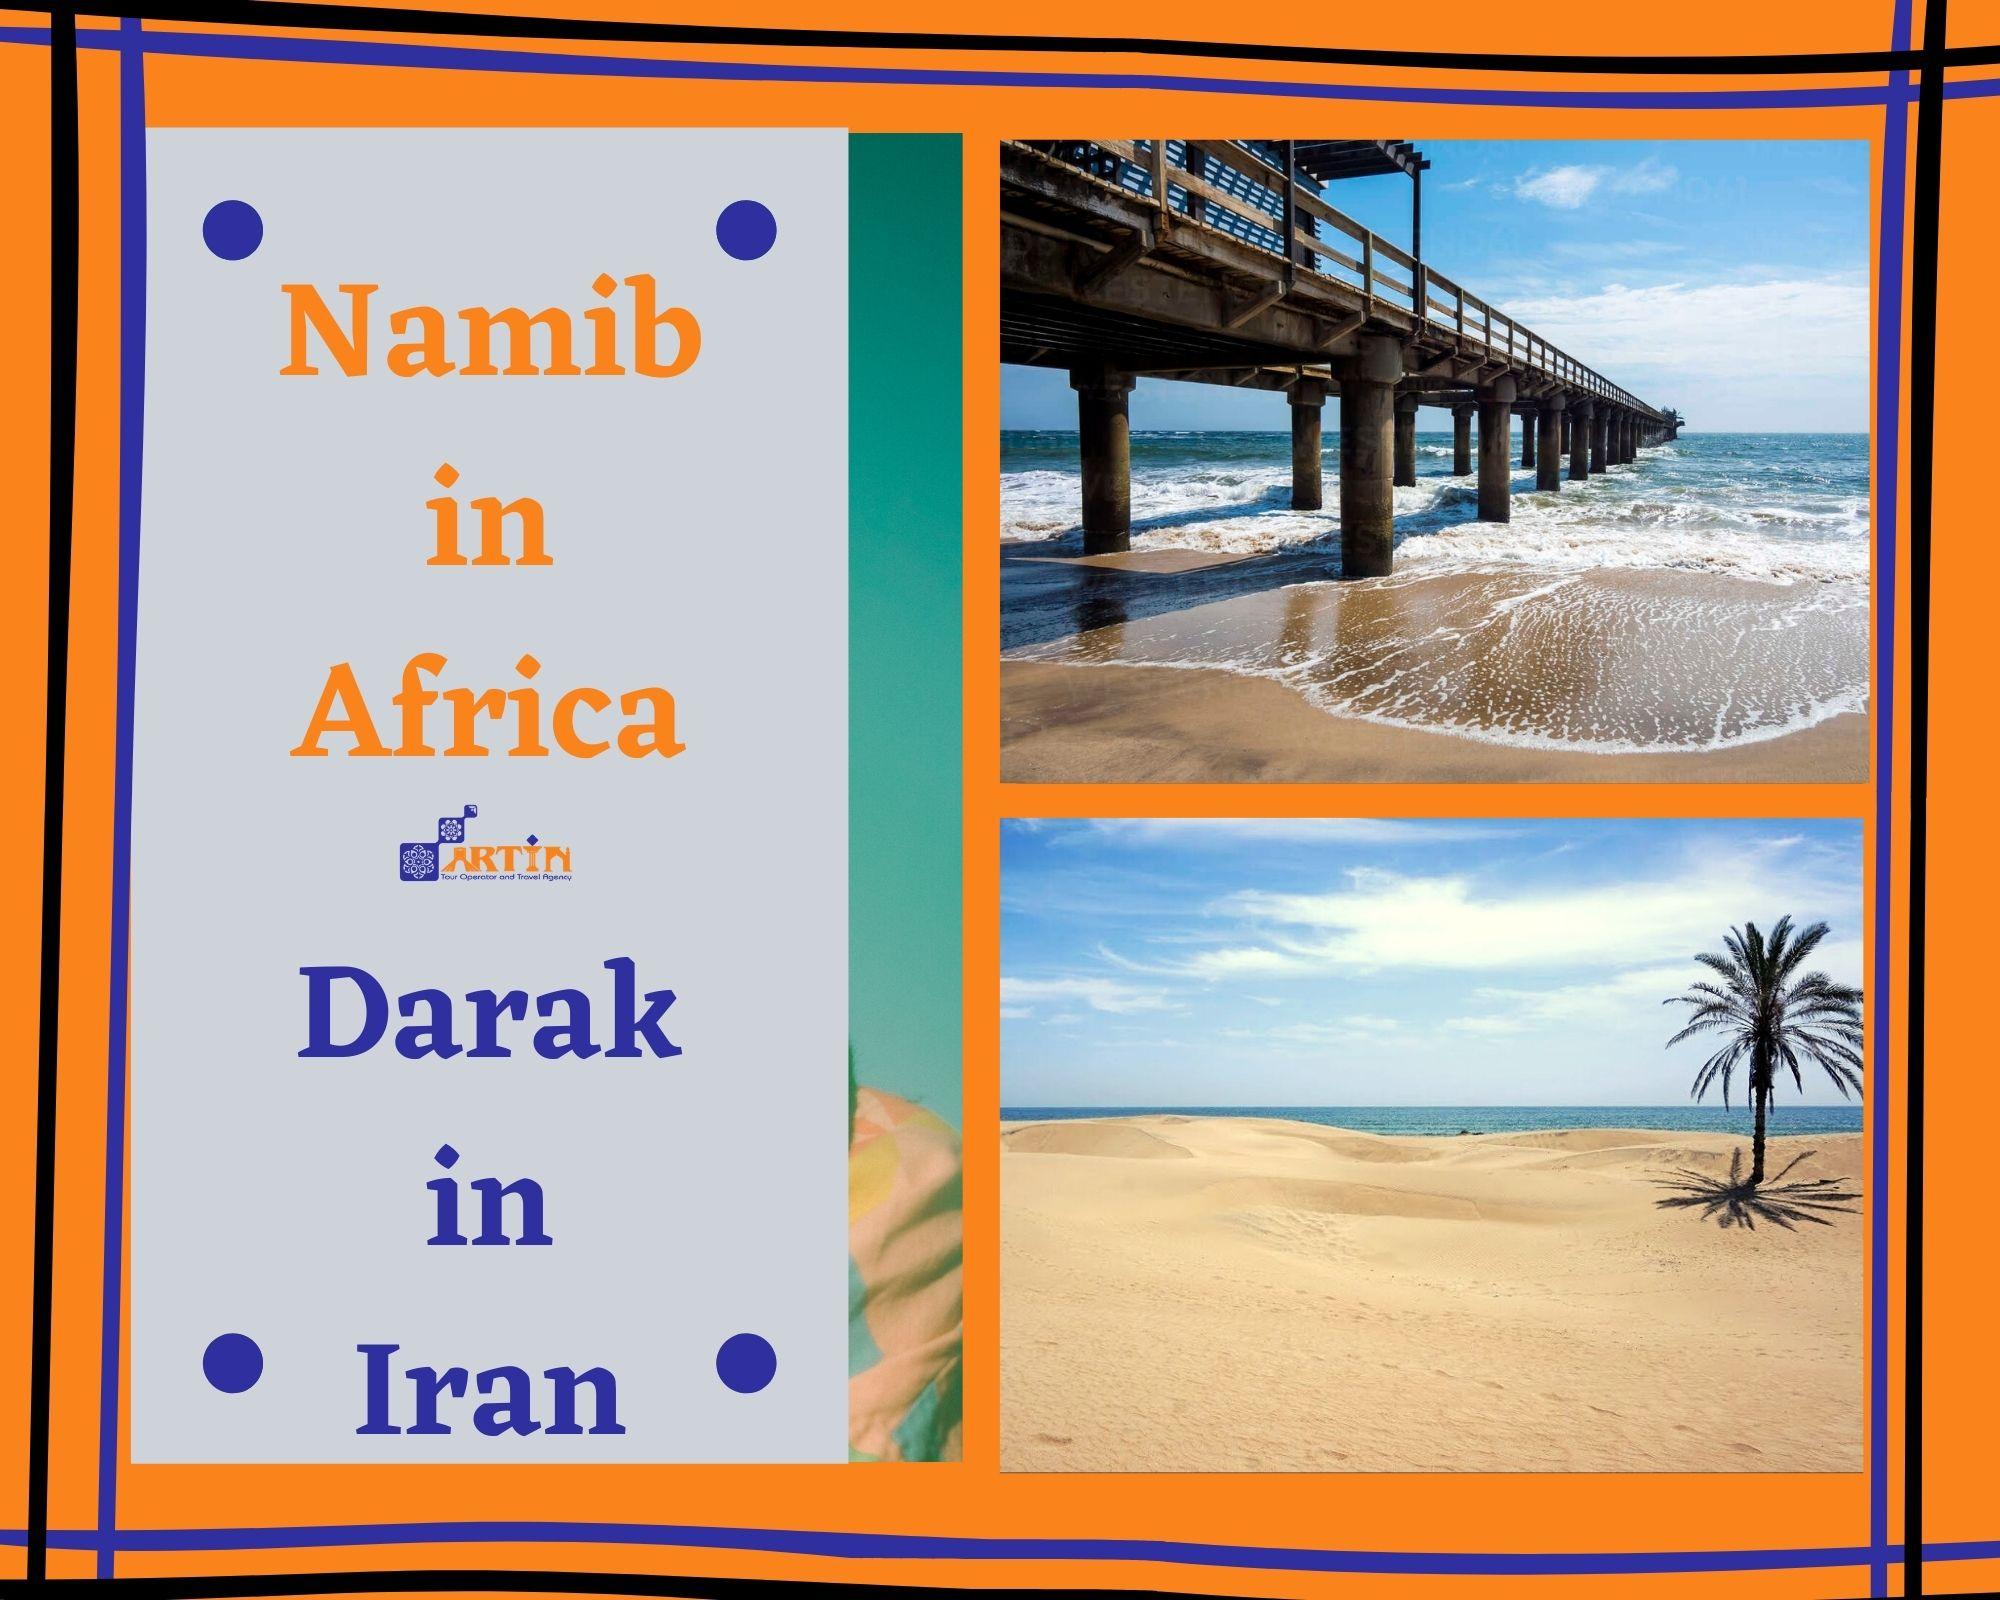 Darak desert in Iran and Namibia in Africa travelartin.com